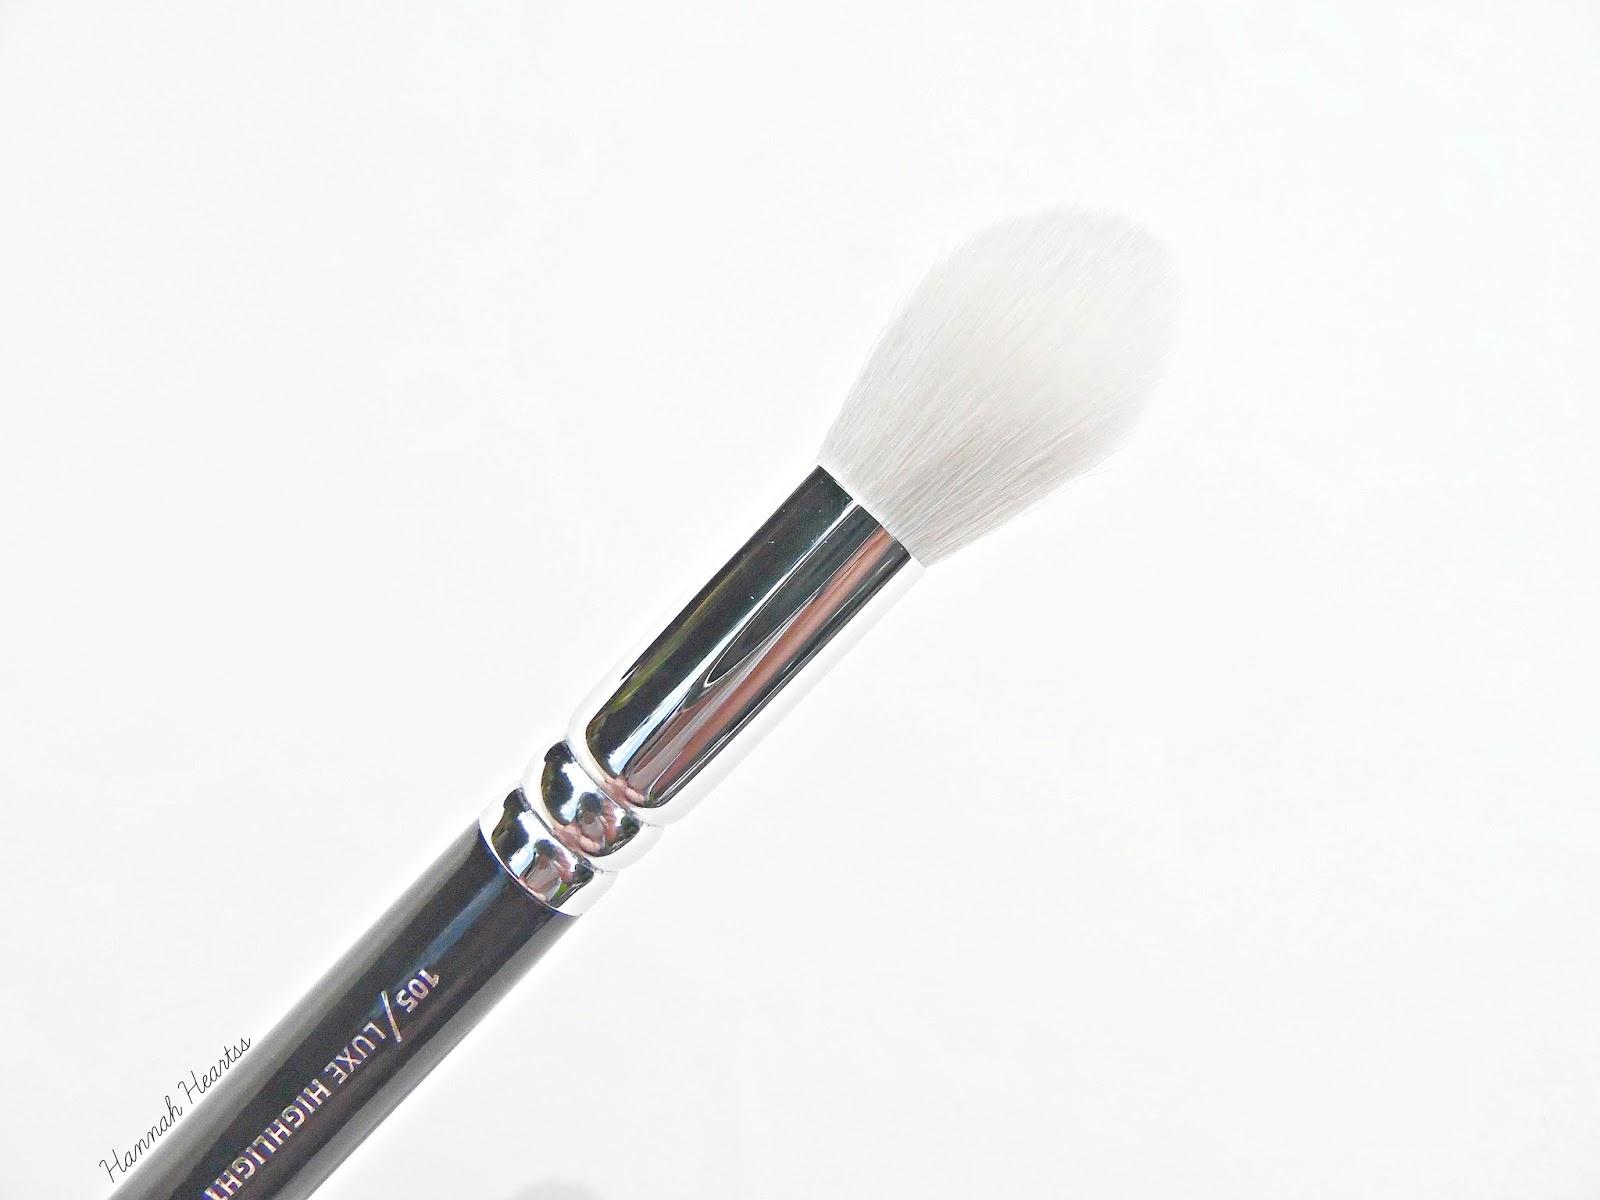 Zoeva 105 Luxe Highlight Brush Review